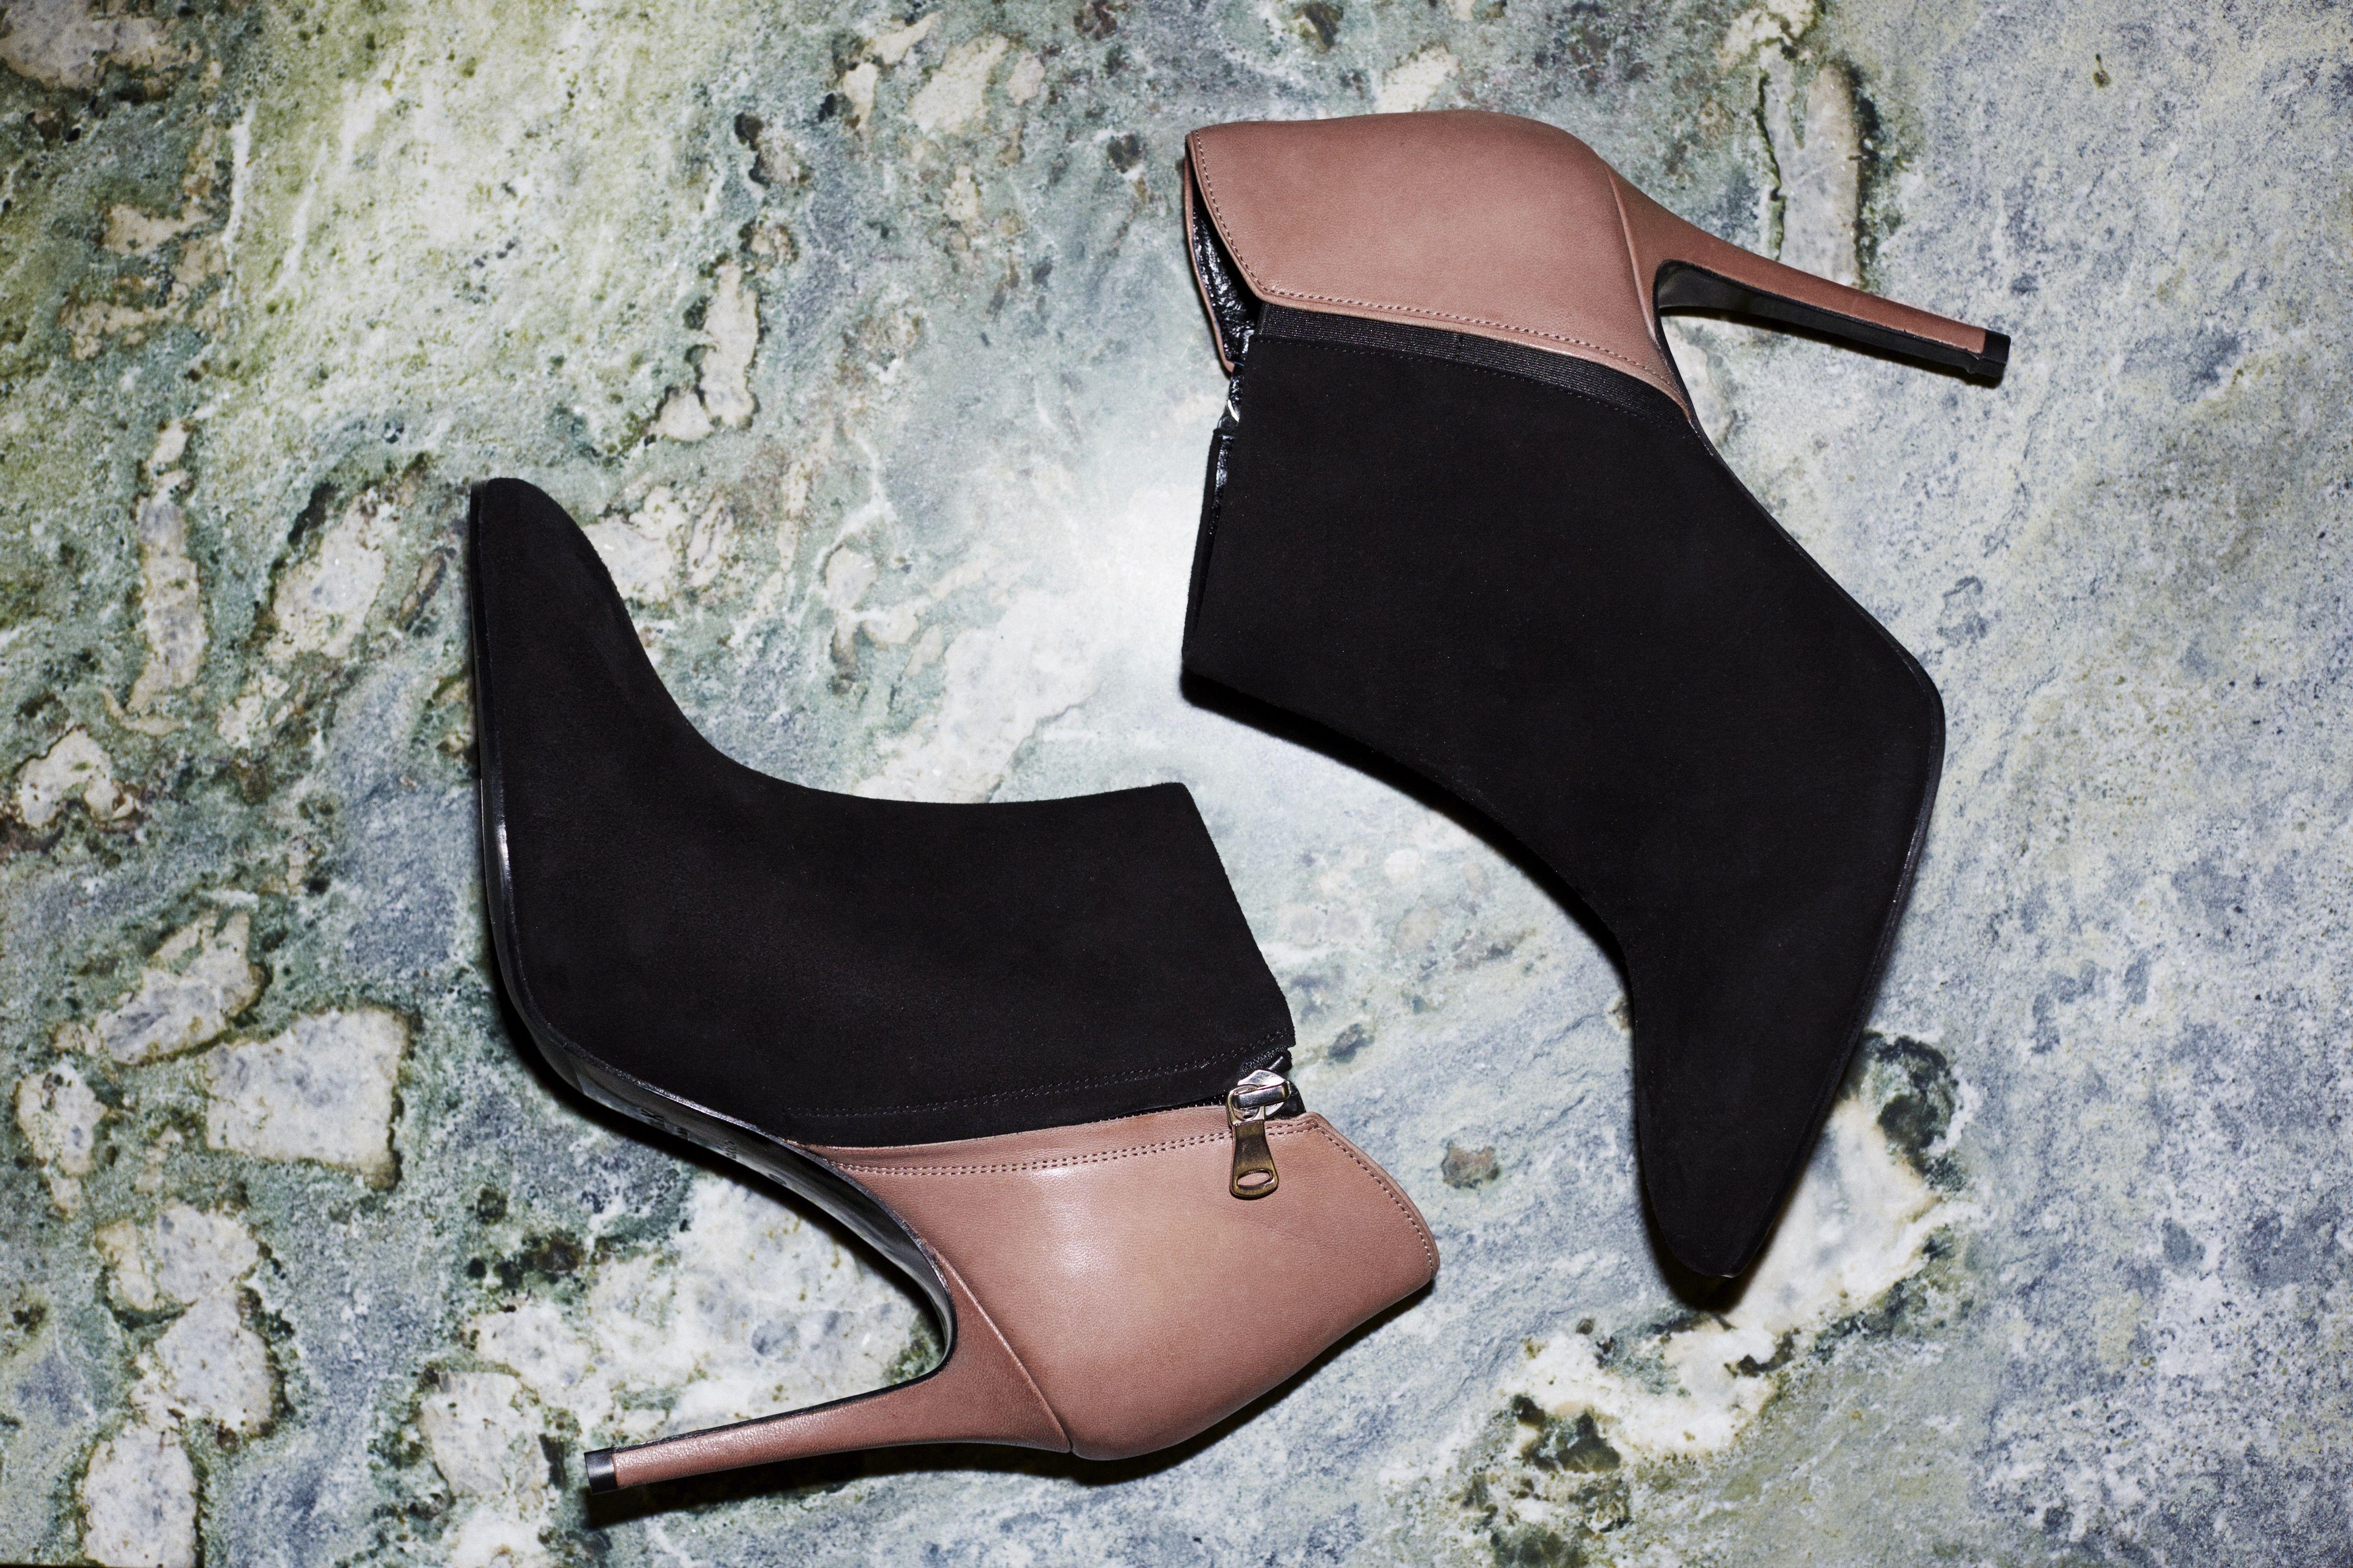 Filippa K high heel boots http://www.filippa-k.com/en